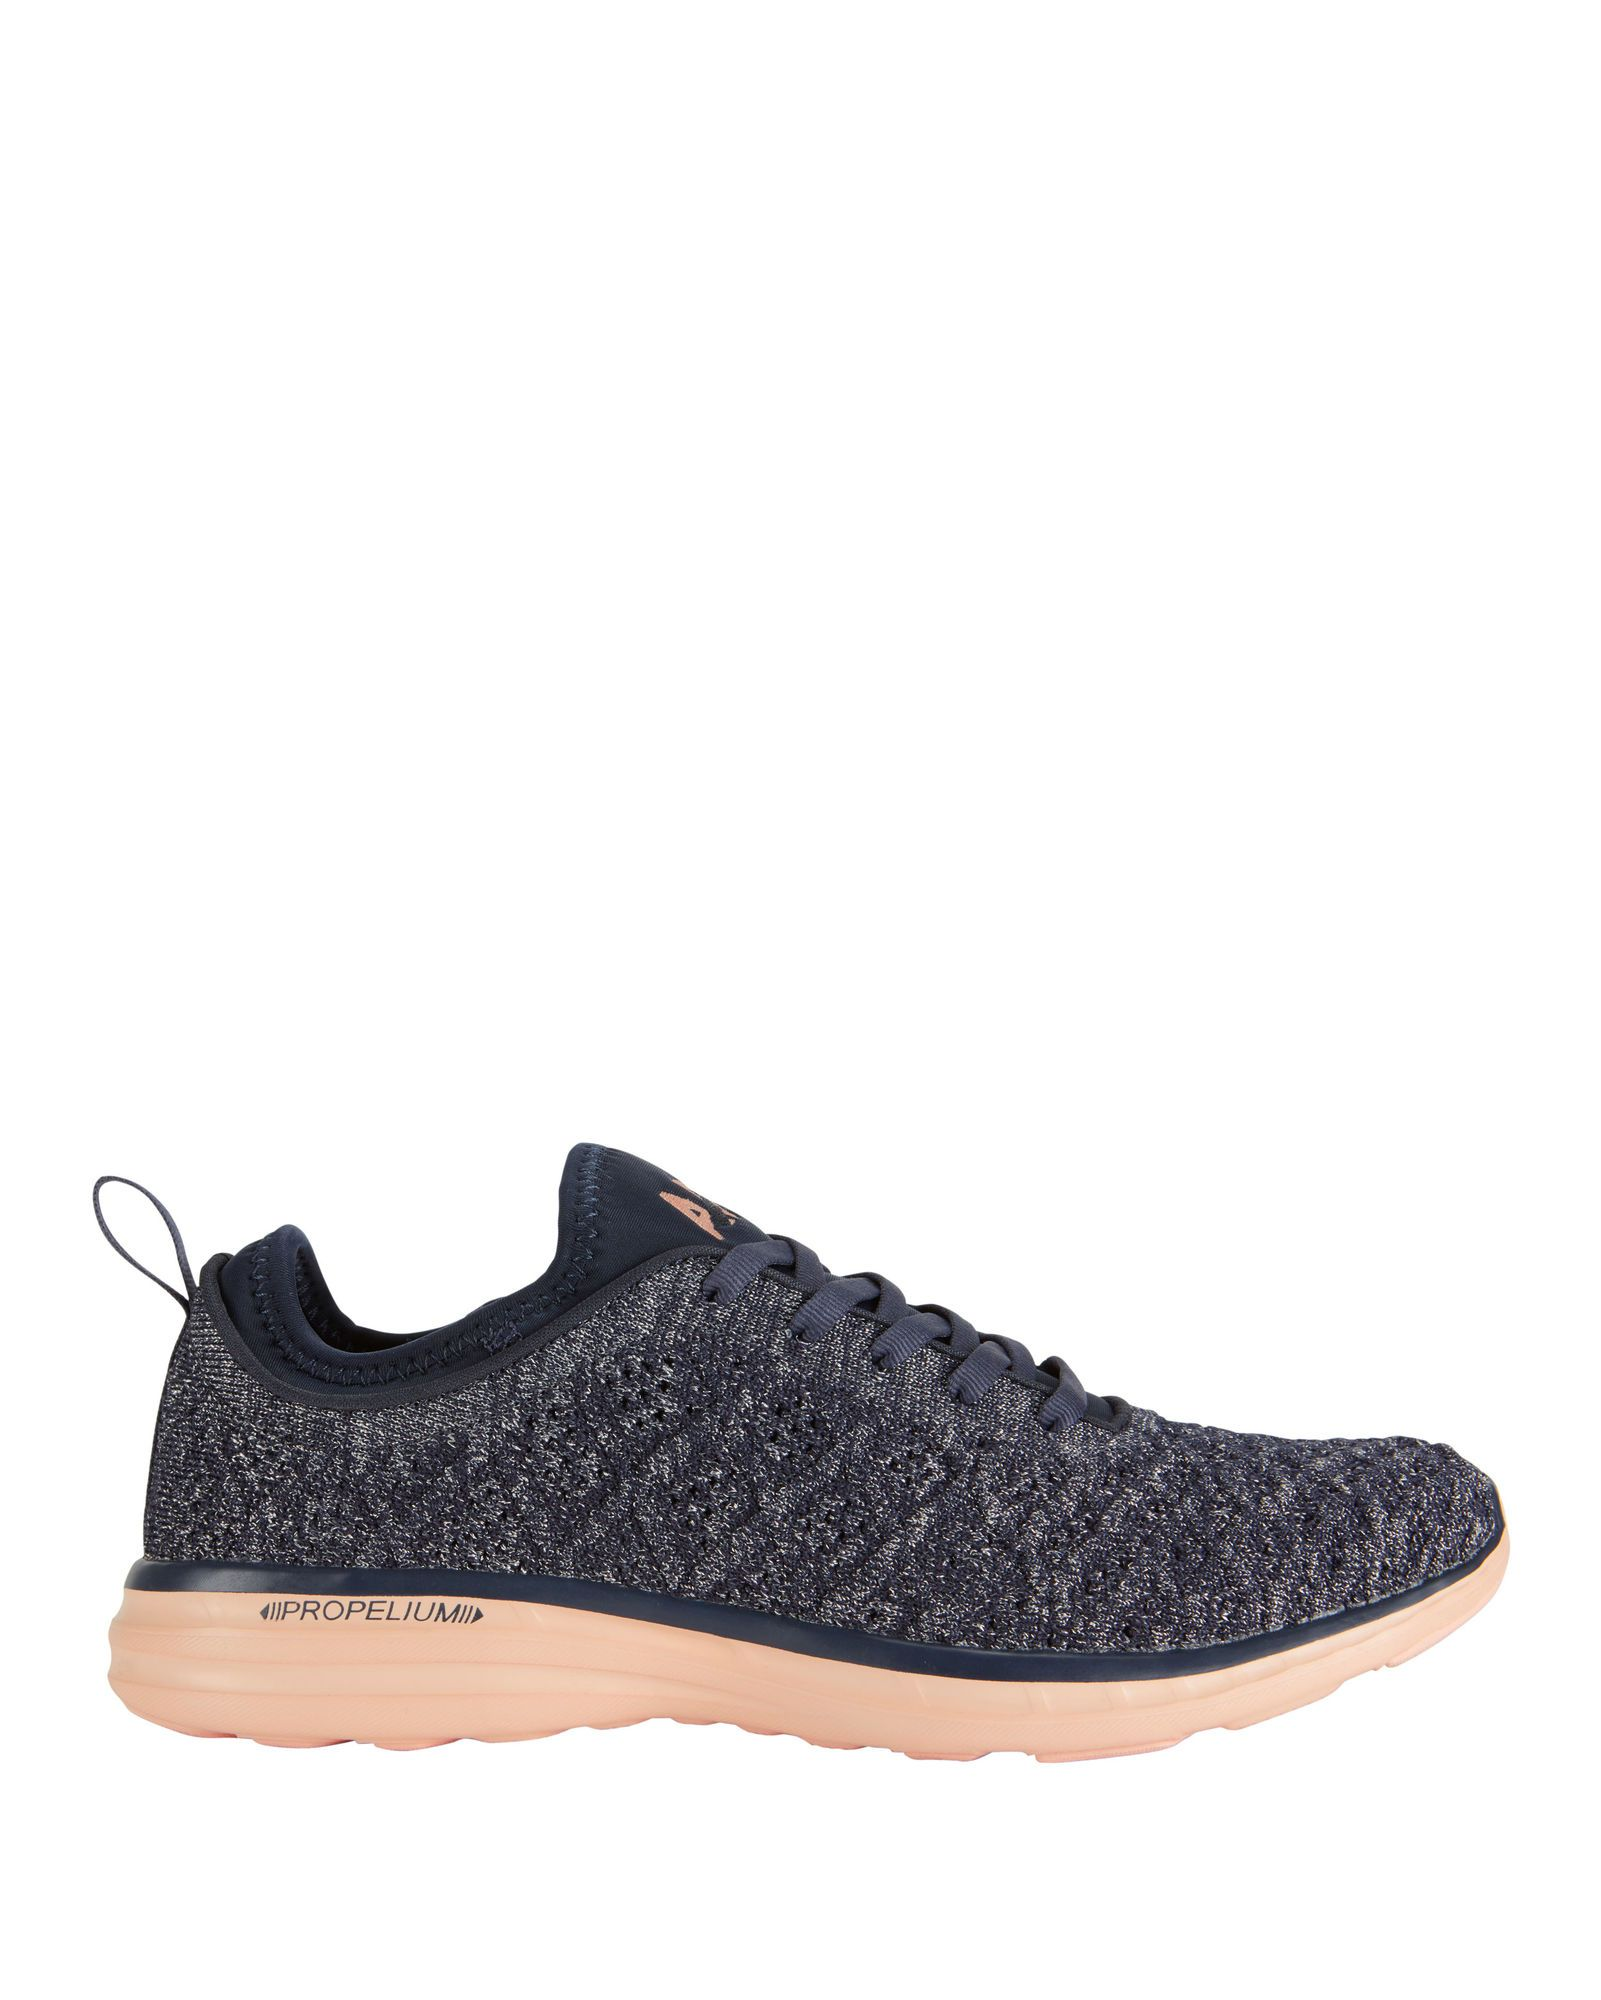 Techloom Phantom 3d Mesh Sneakers - Gray Athletic Propulsion Labs Dy9deKyS1l